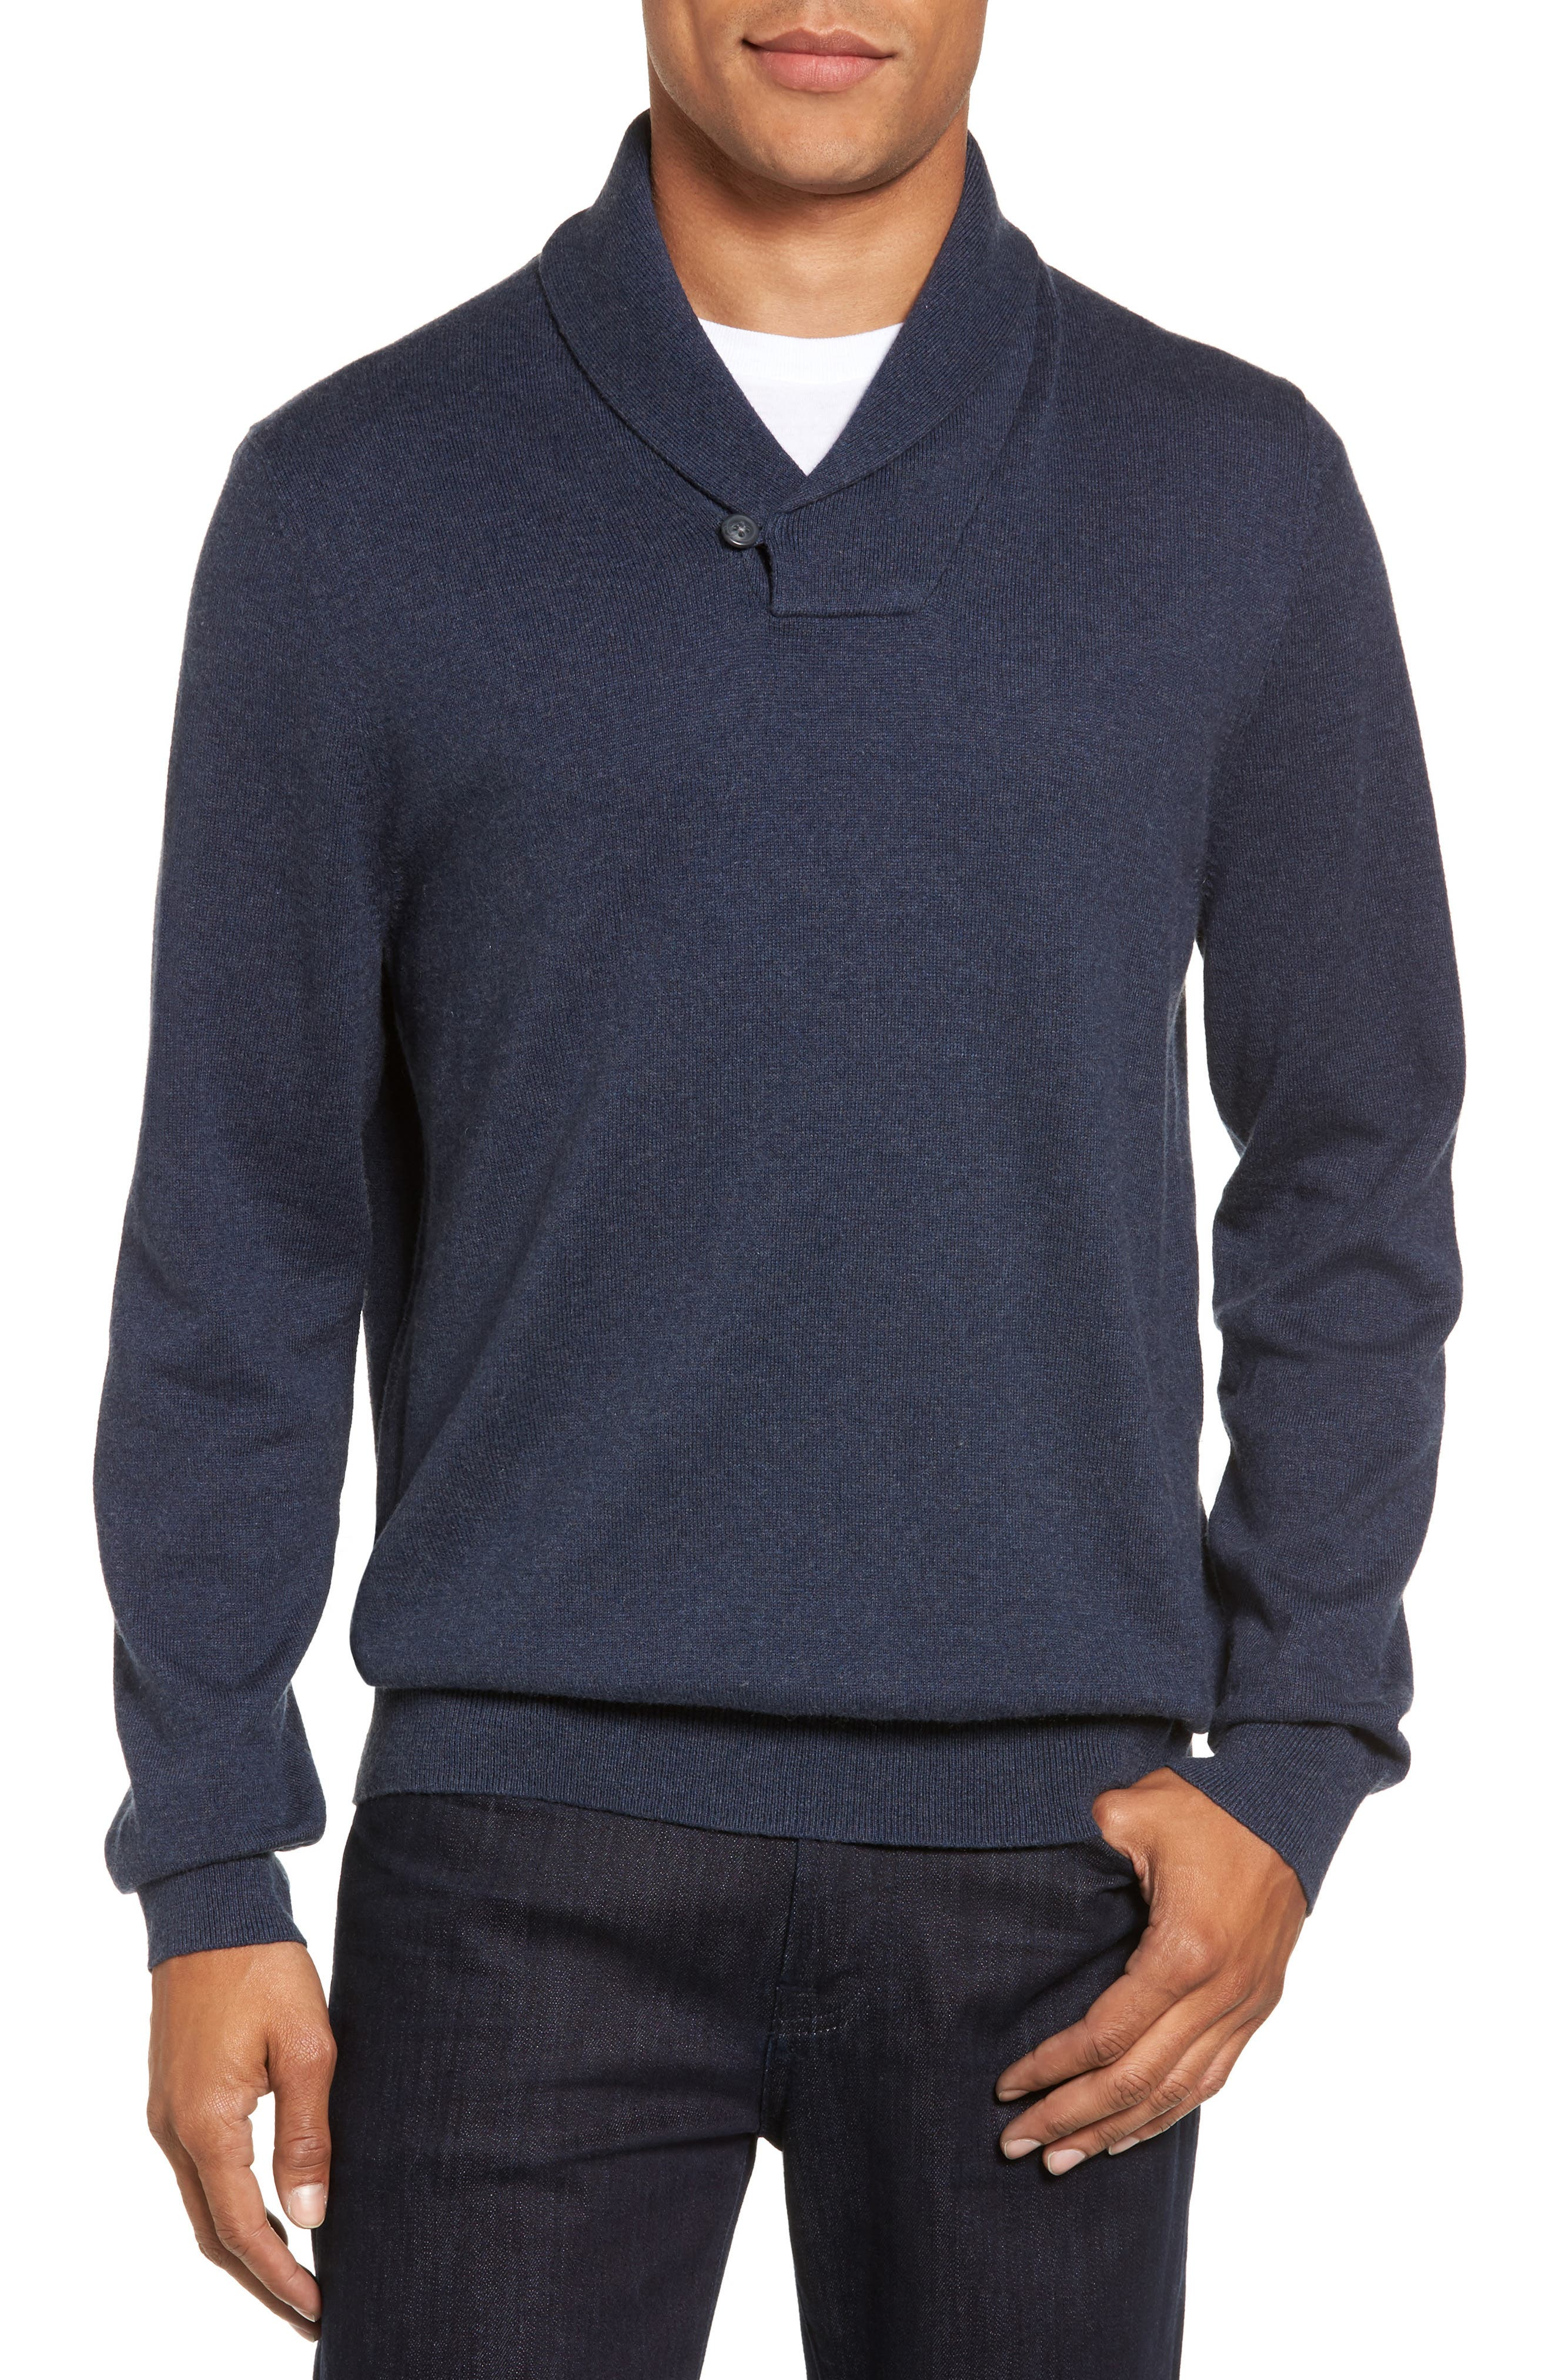 Alternate Image 1 Selected - Nordstrom Men's Shop Cotton & Cashmere Shawl Collar Sweater (Regular & Tall)